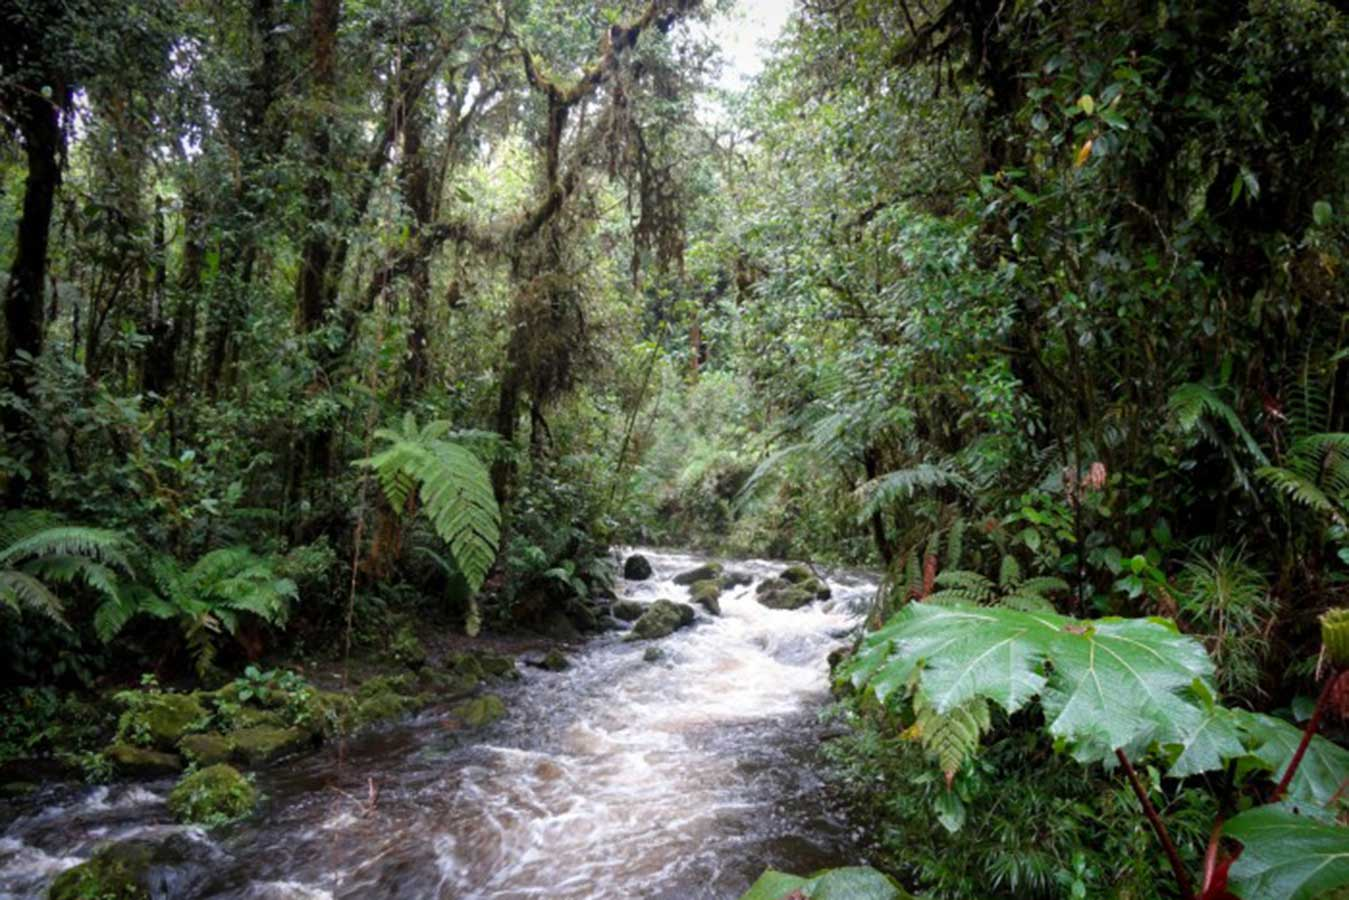 san-rafael-de-heredia-refugio-de-vida-silvestre-costa-rica-decouverte